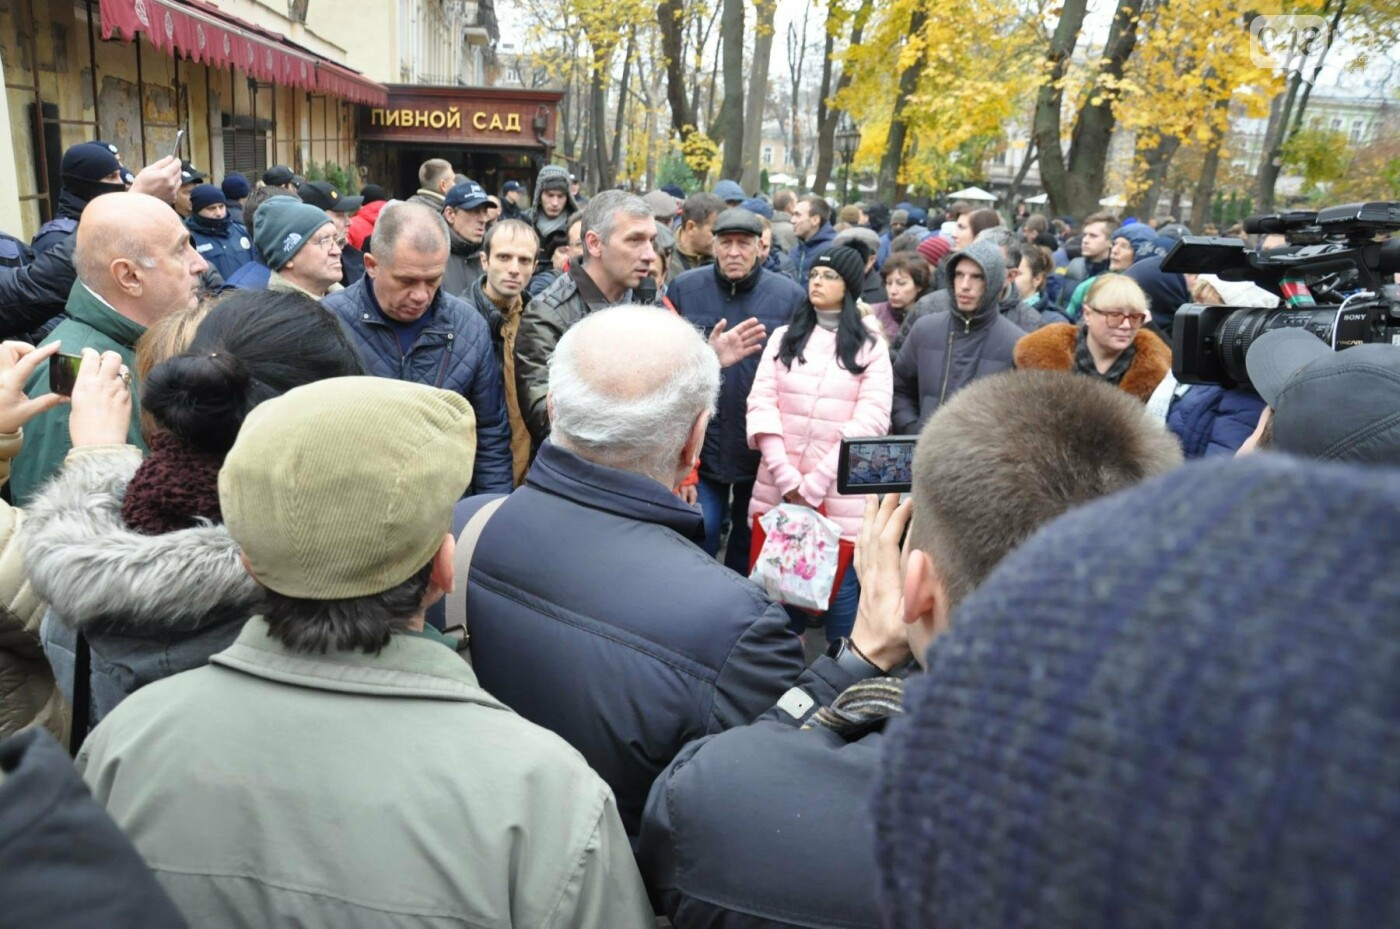 Около 5 сотен одесситов протестовали против застройки Горсада (ФОТО) , фото-18